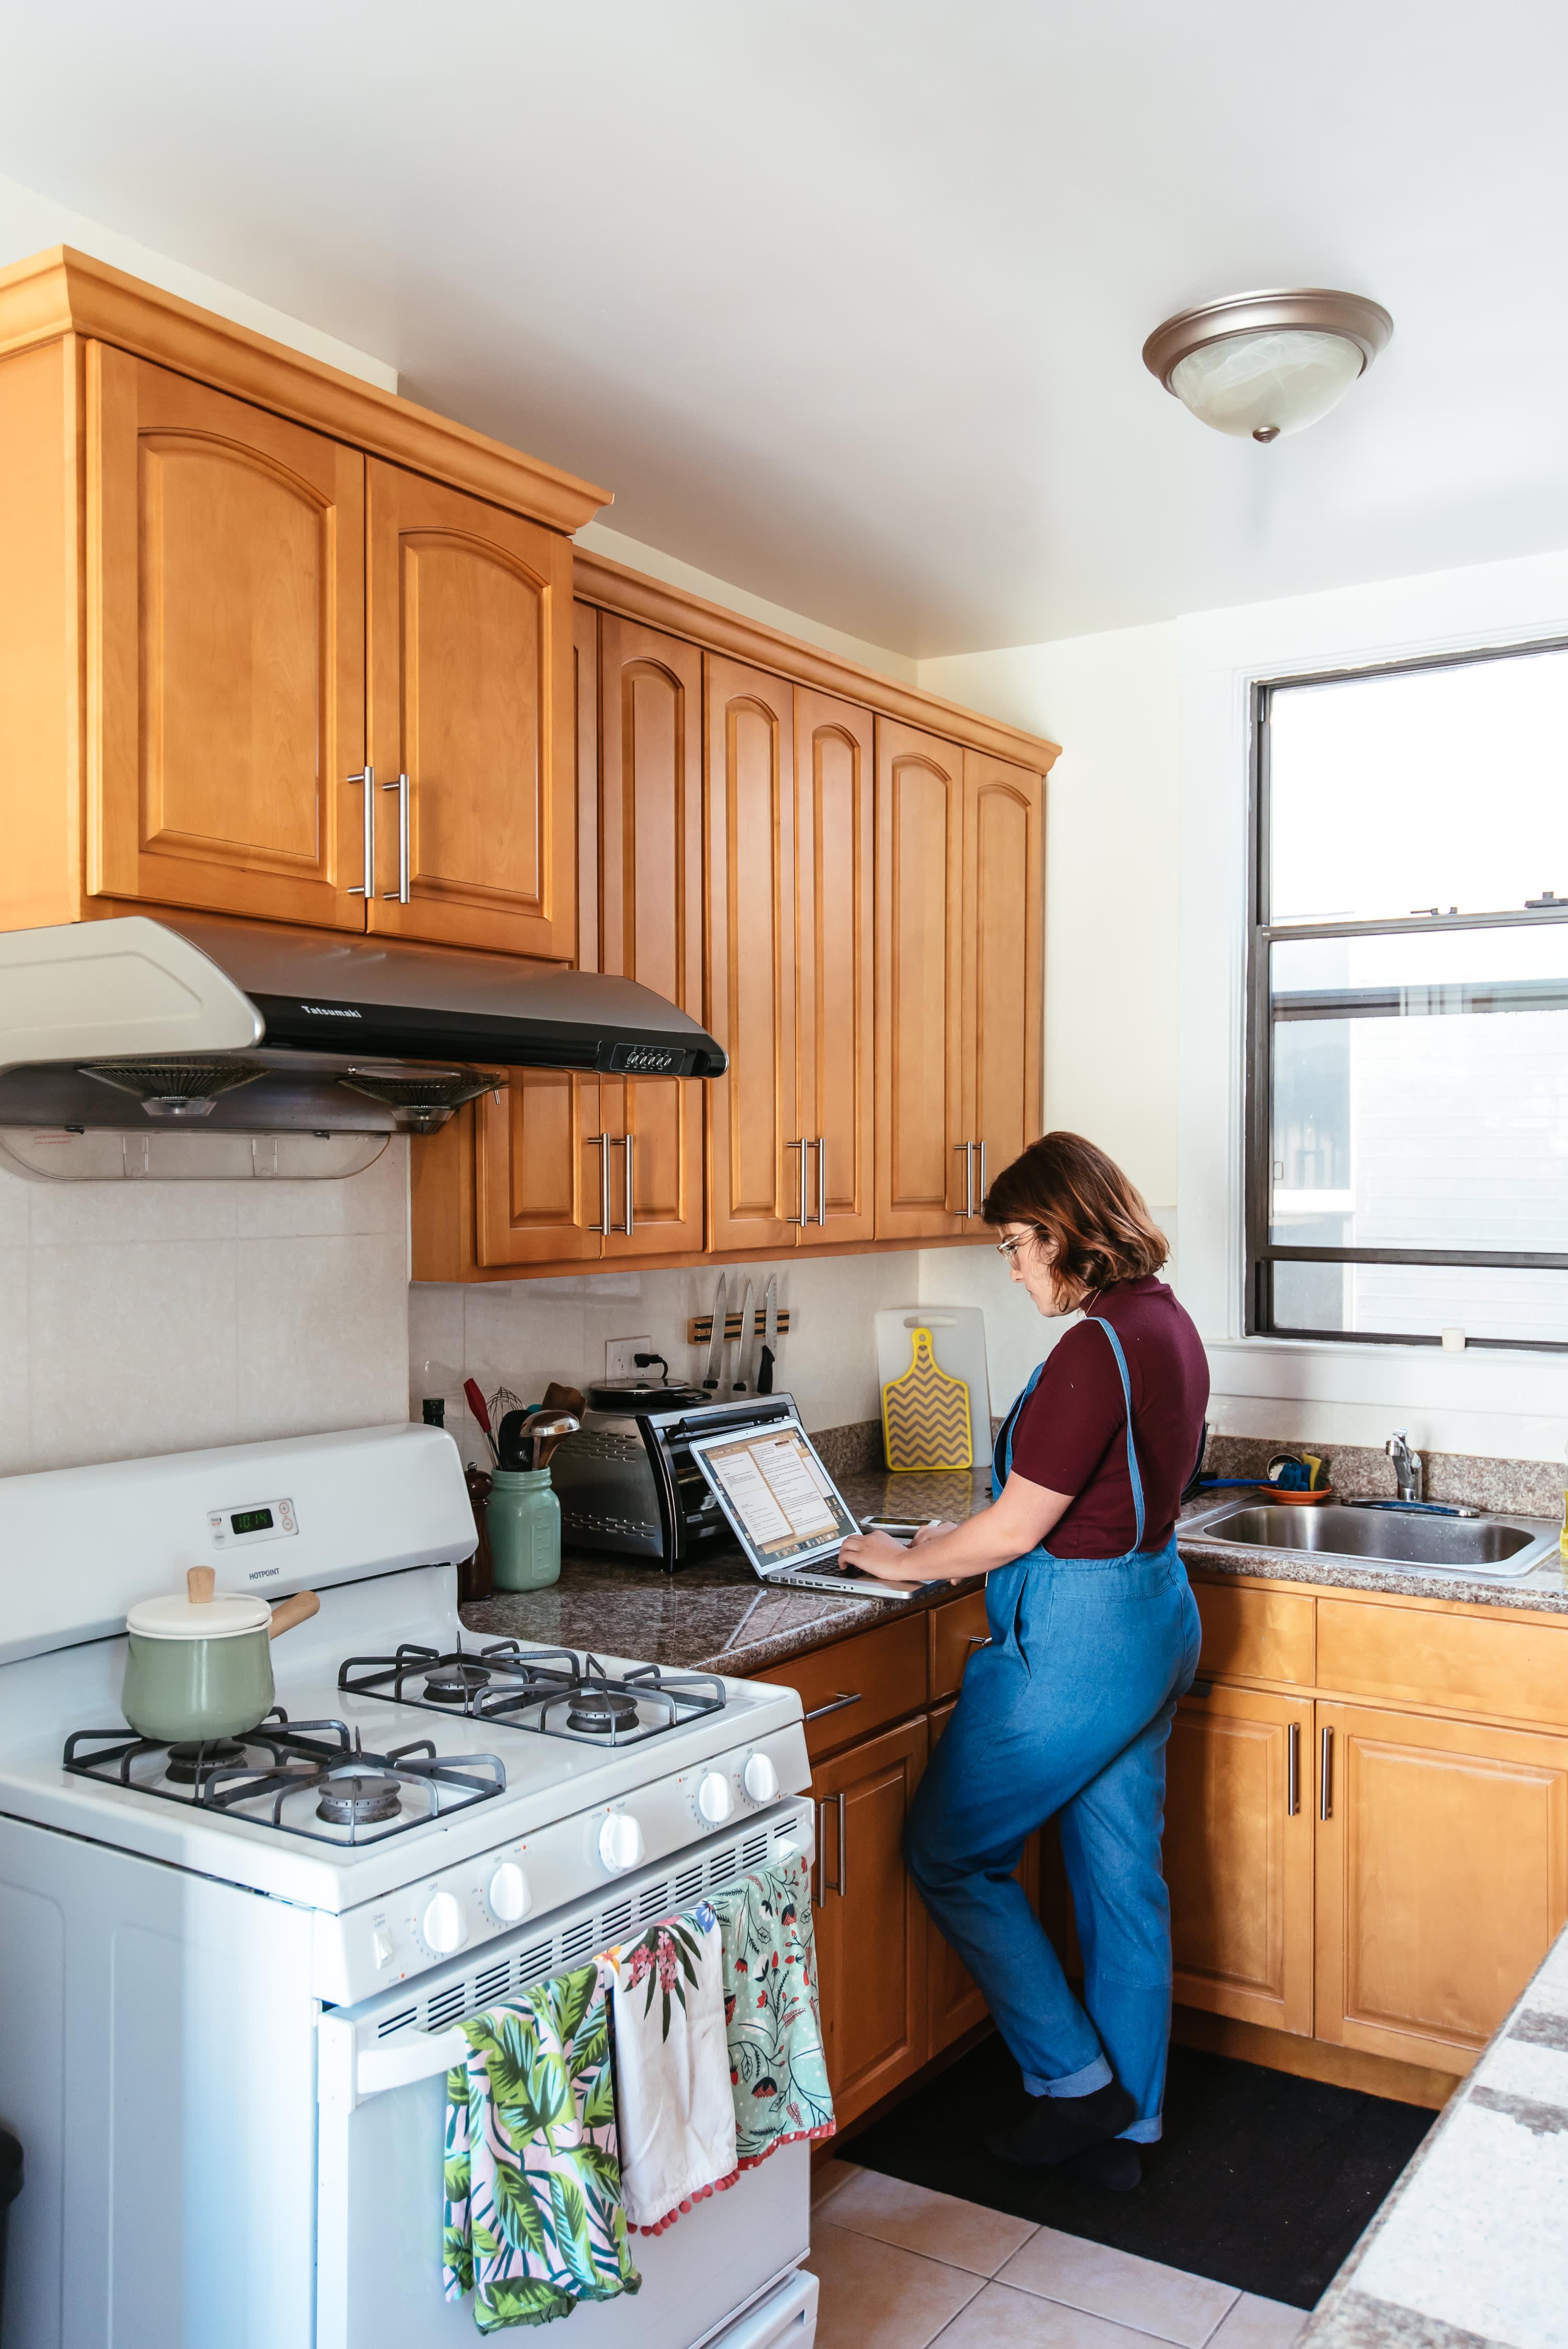 House Tour: A Craigslist Chic San Francisco Apartment ...